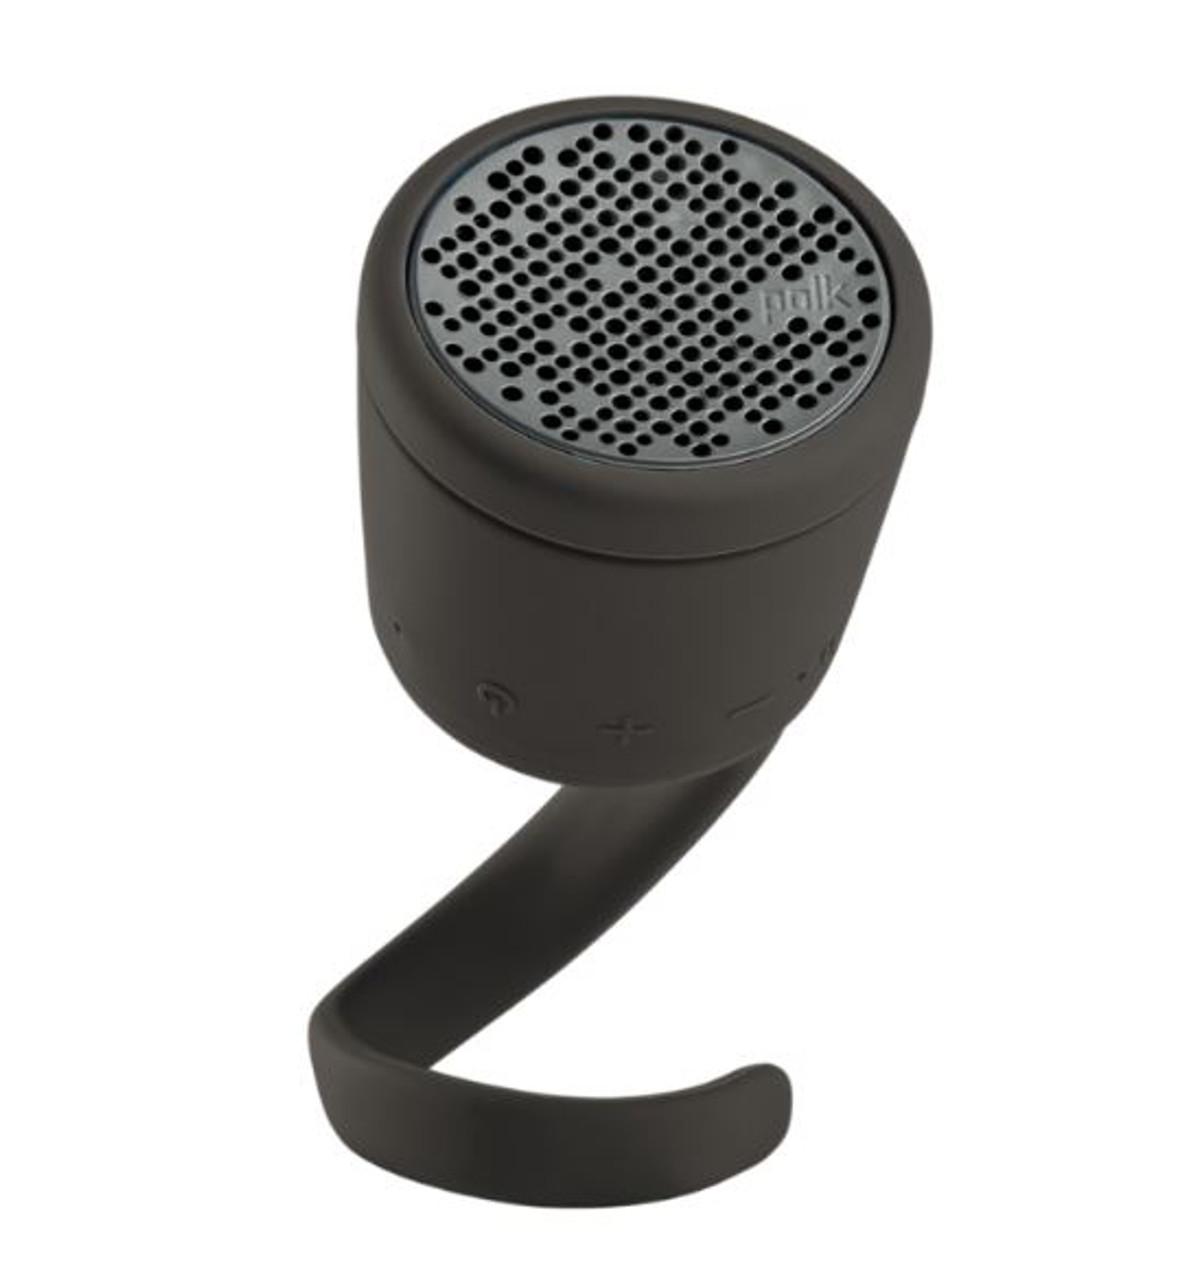 Polk BSMNBK-A Audio Boom Swimmer DUO Bluetooth & Waterproof Speaker - Refurbished